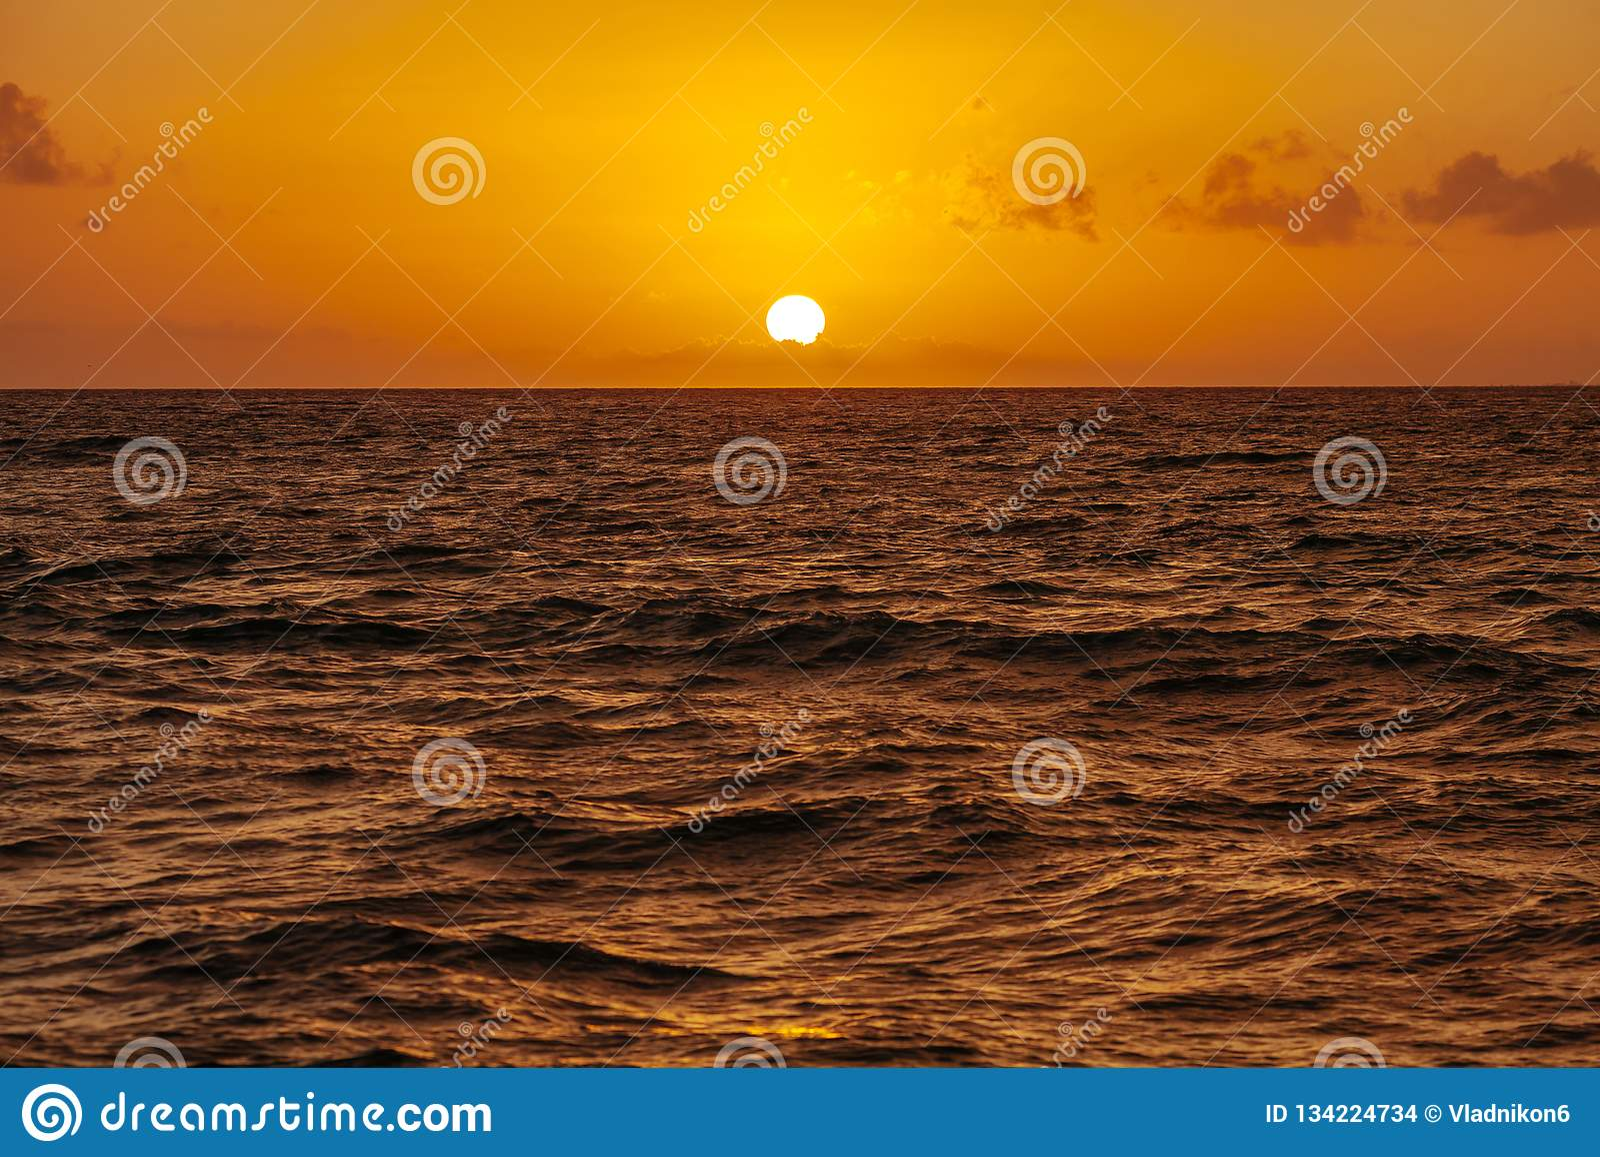 Sonnenaufgang über dem Ozean in Cancun mexiko